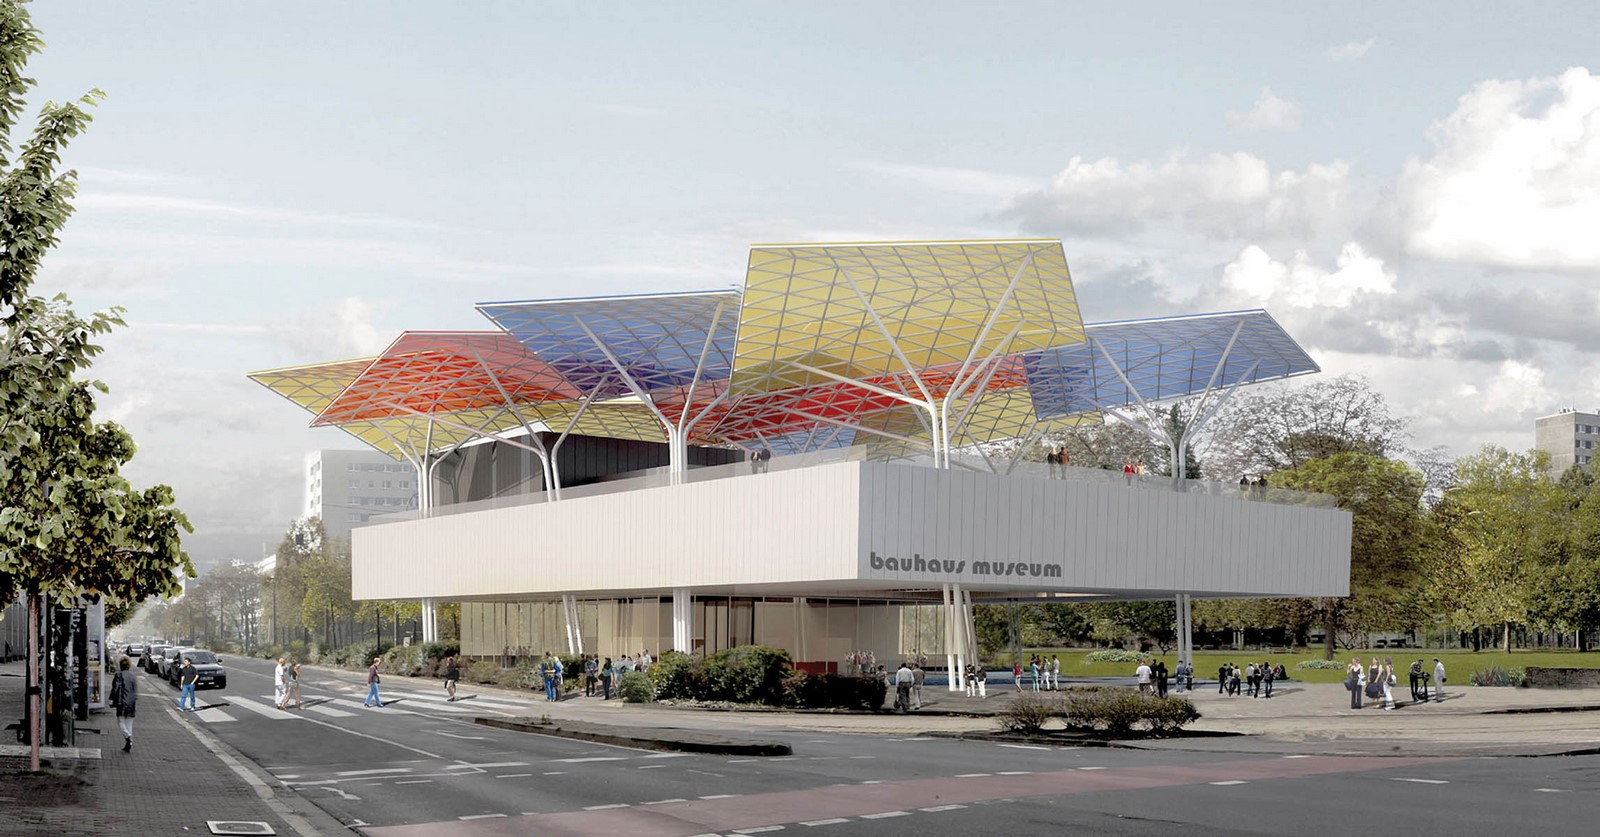 Bauhaus Museum Dessau - Sheet1